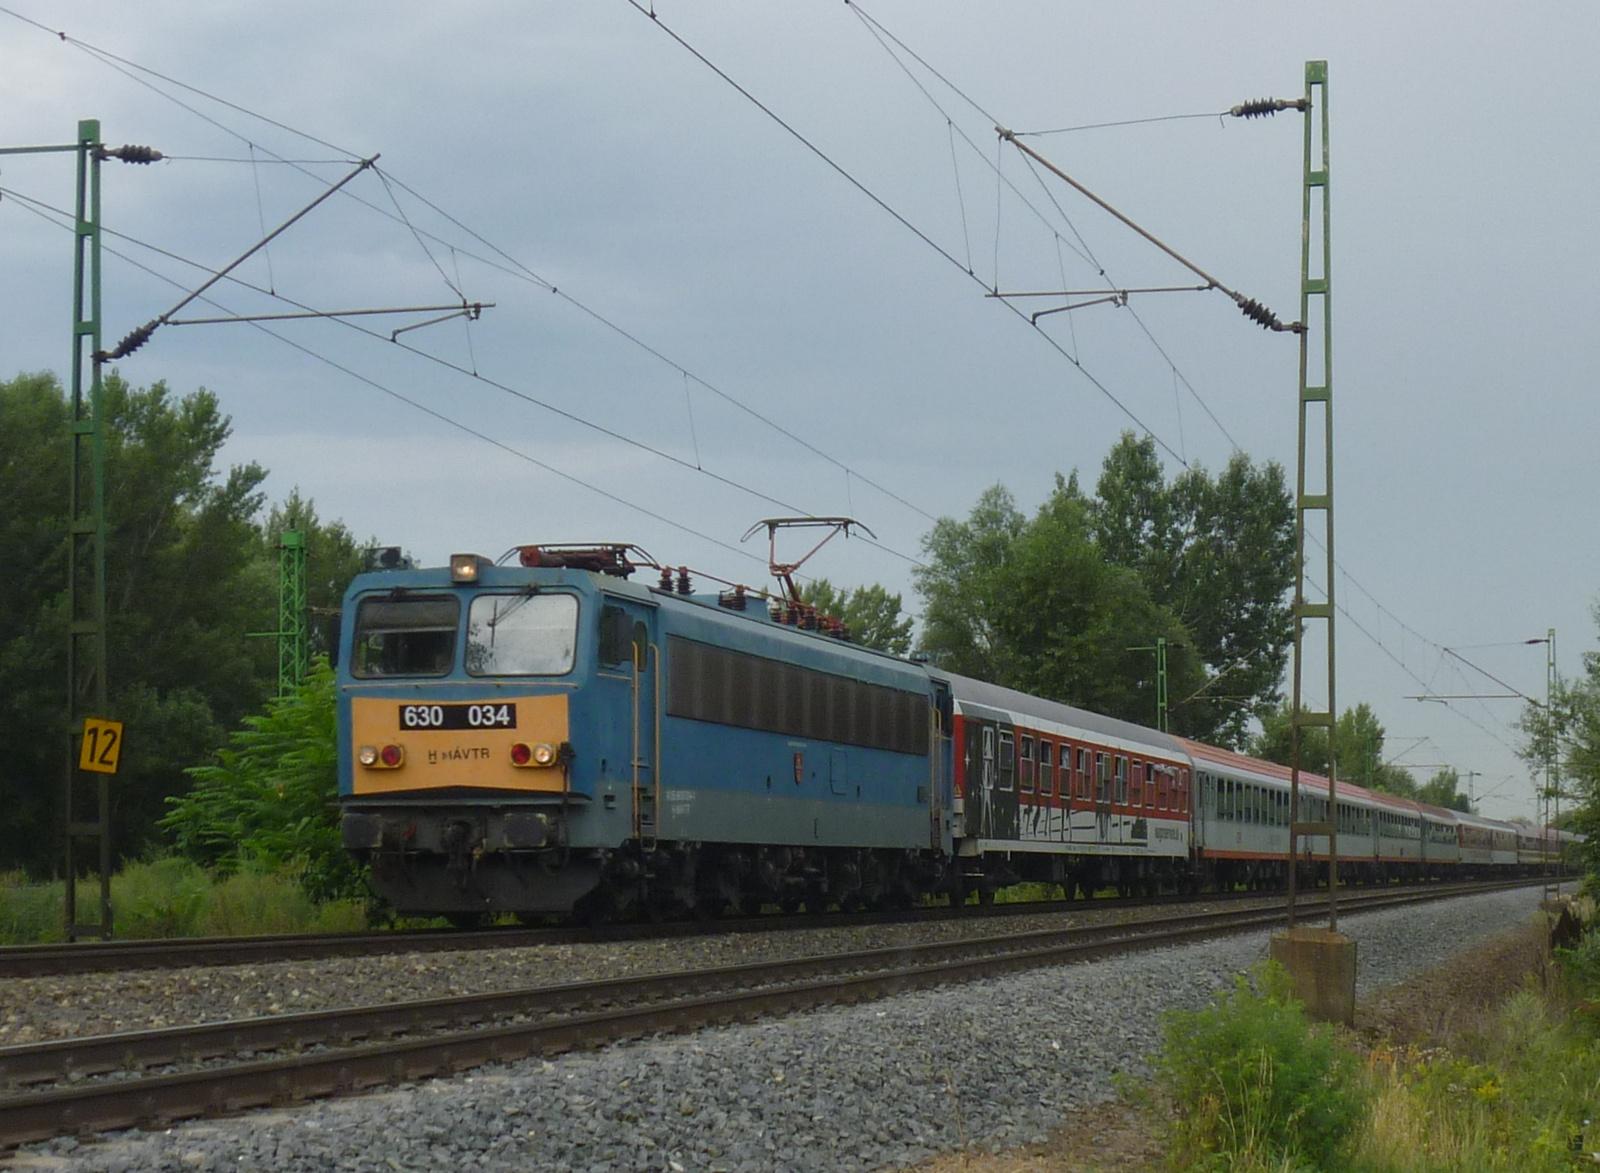 630 034 a Sziget vonattal